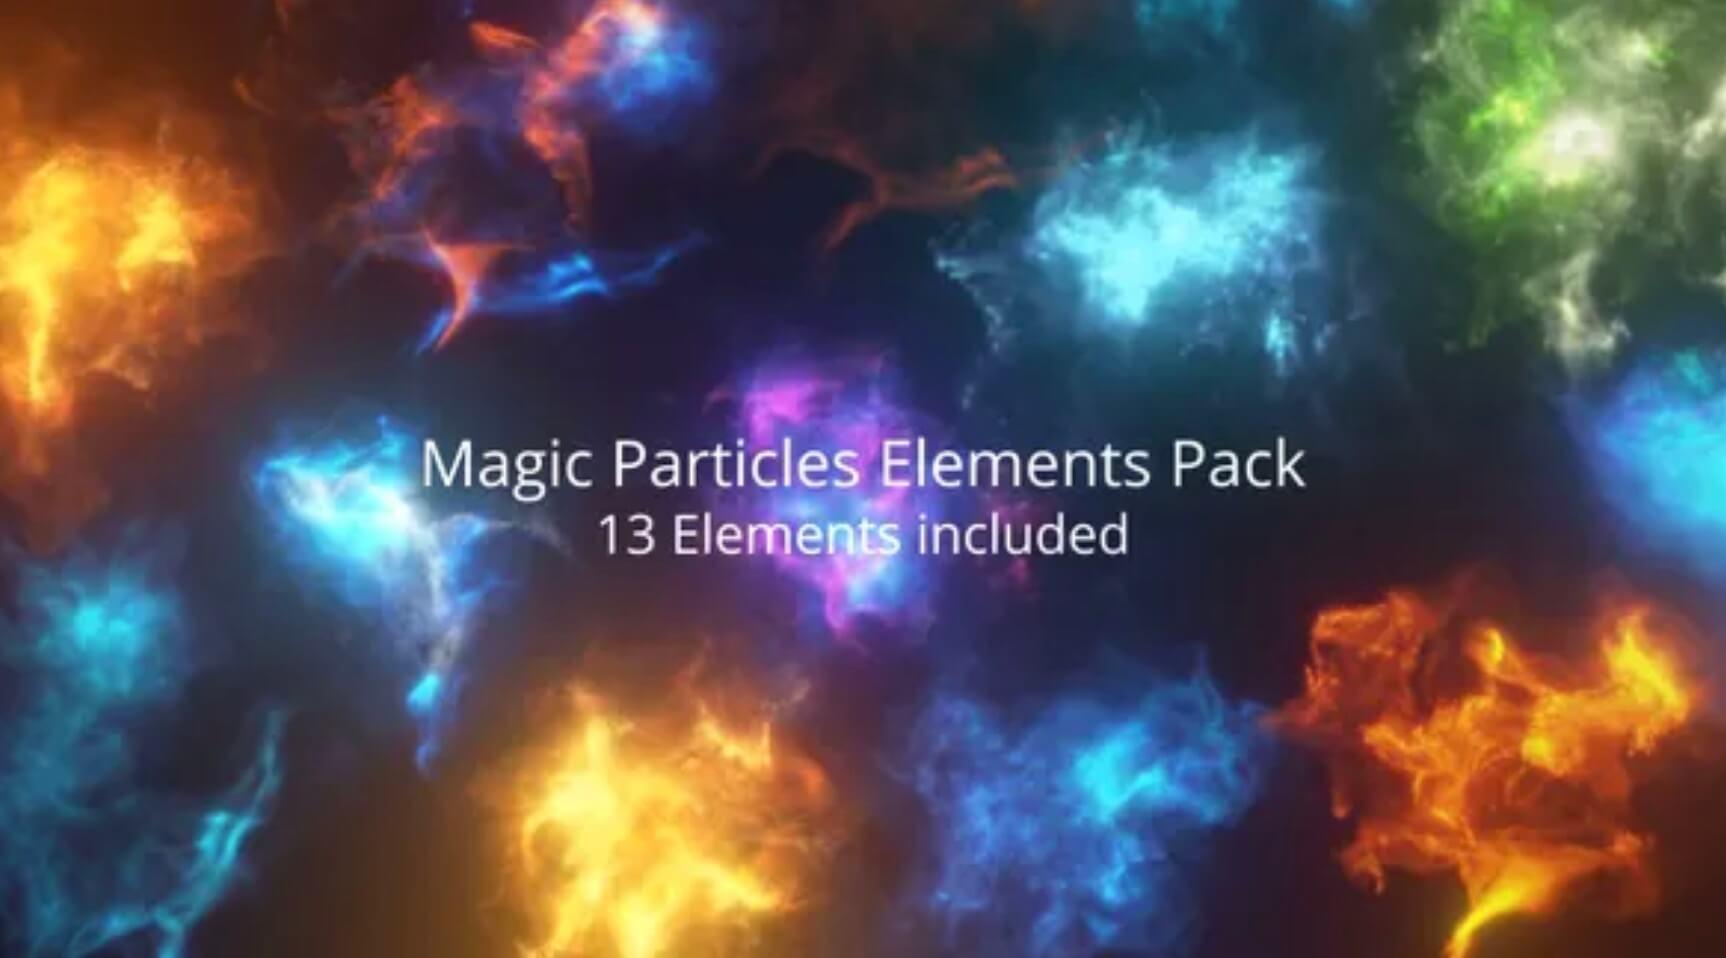 VFX魔法粒子元素包插图